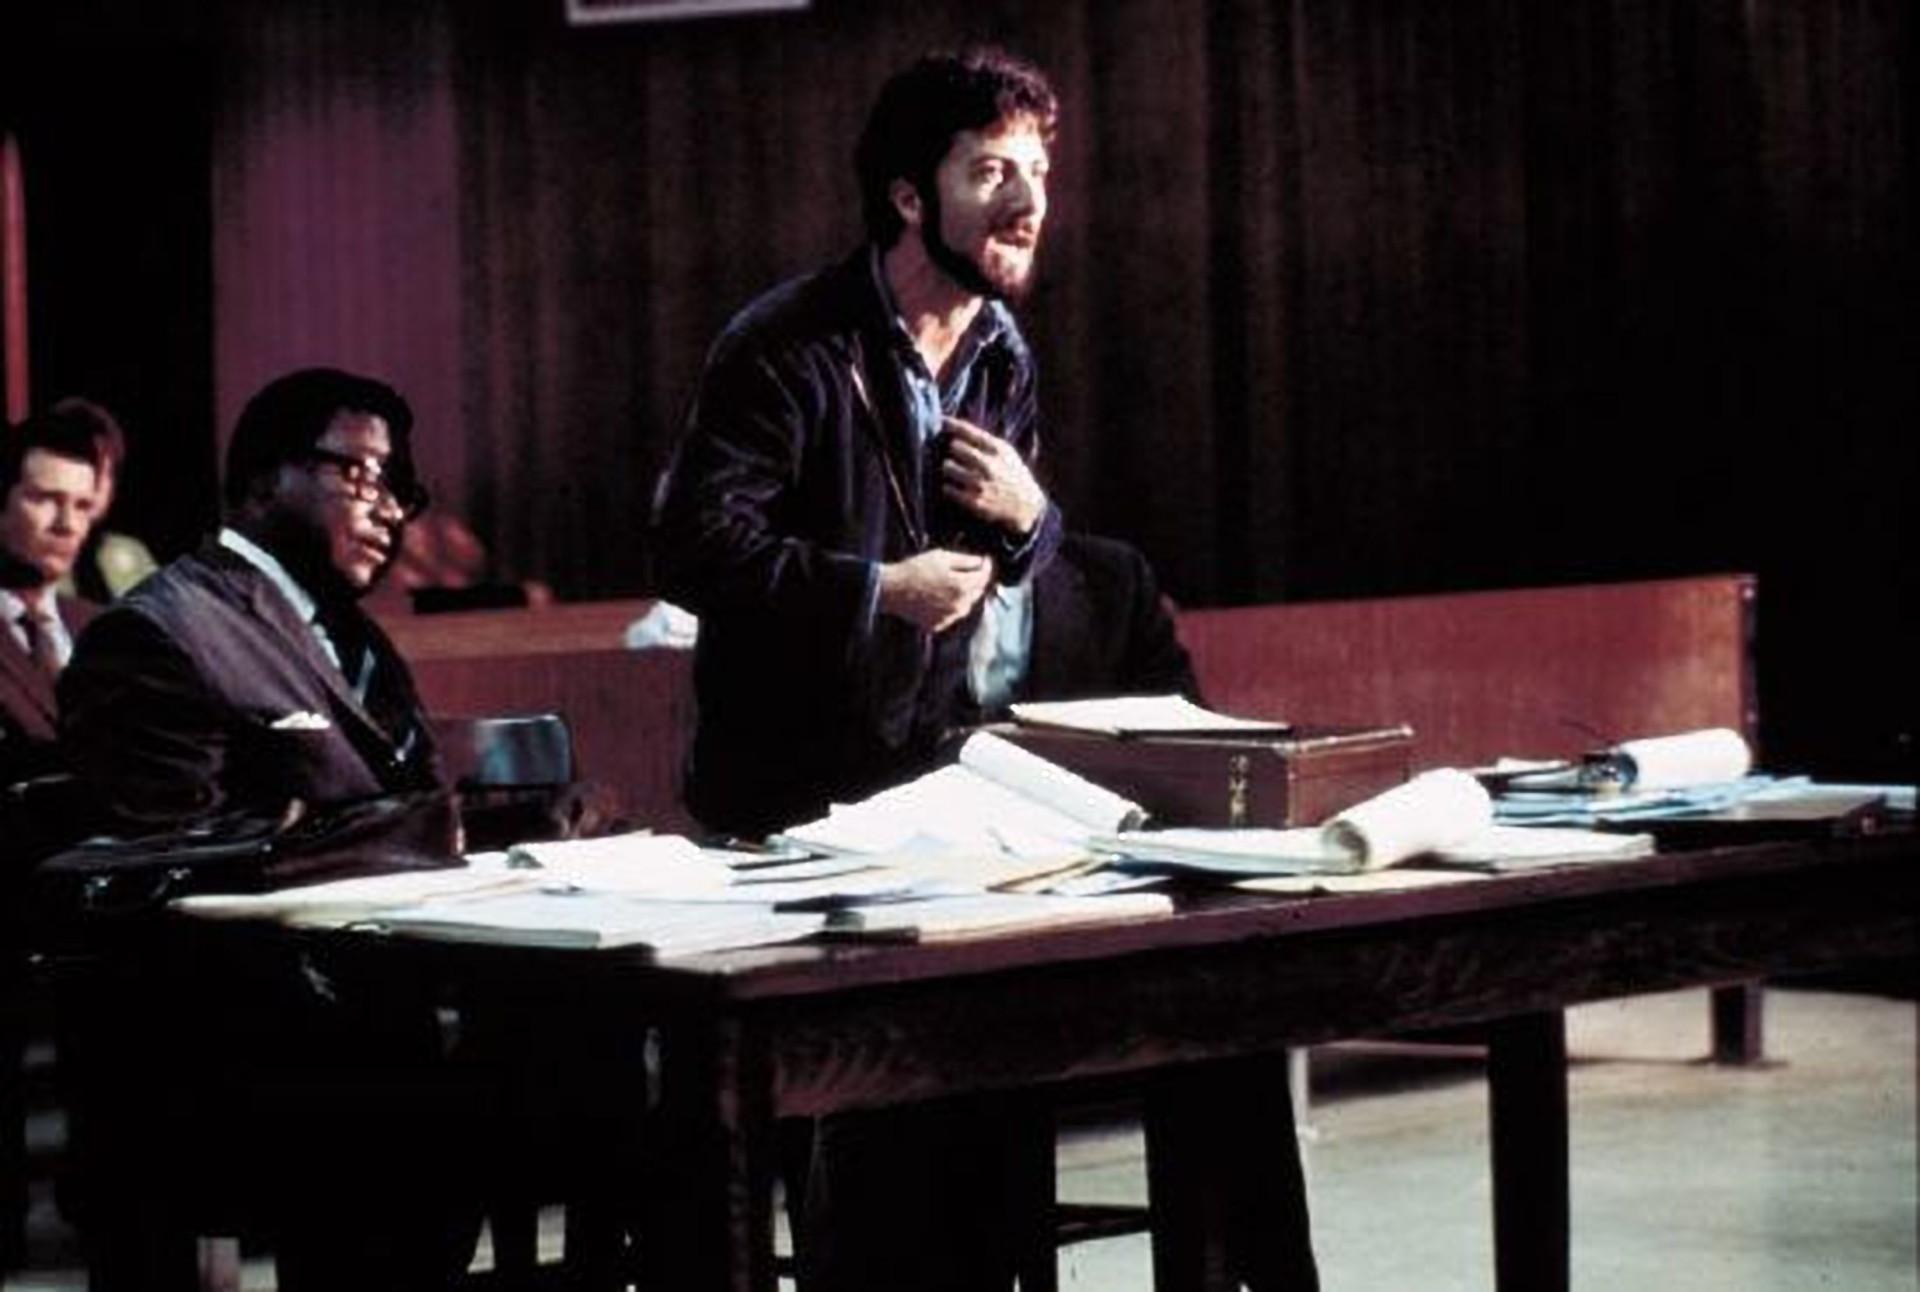 Relembre as várias facetas do ator Dustin Hoffman